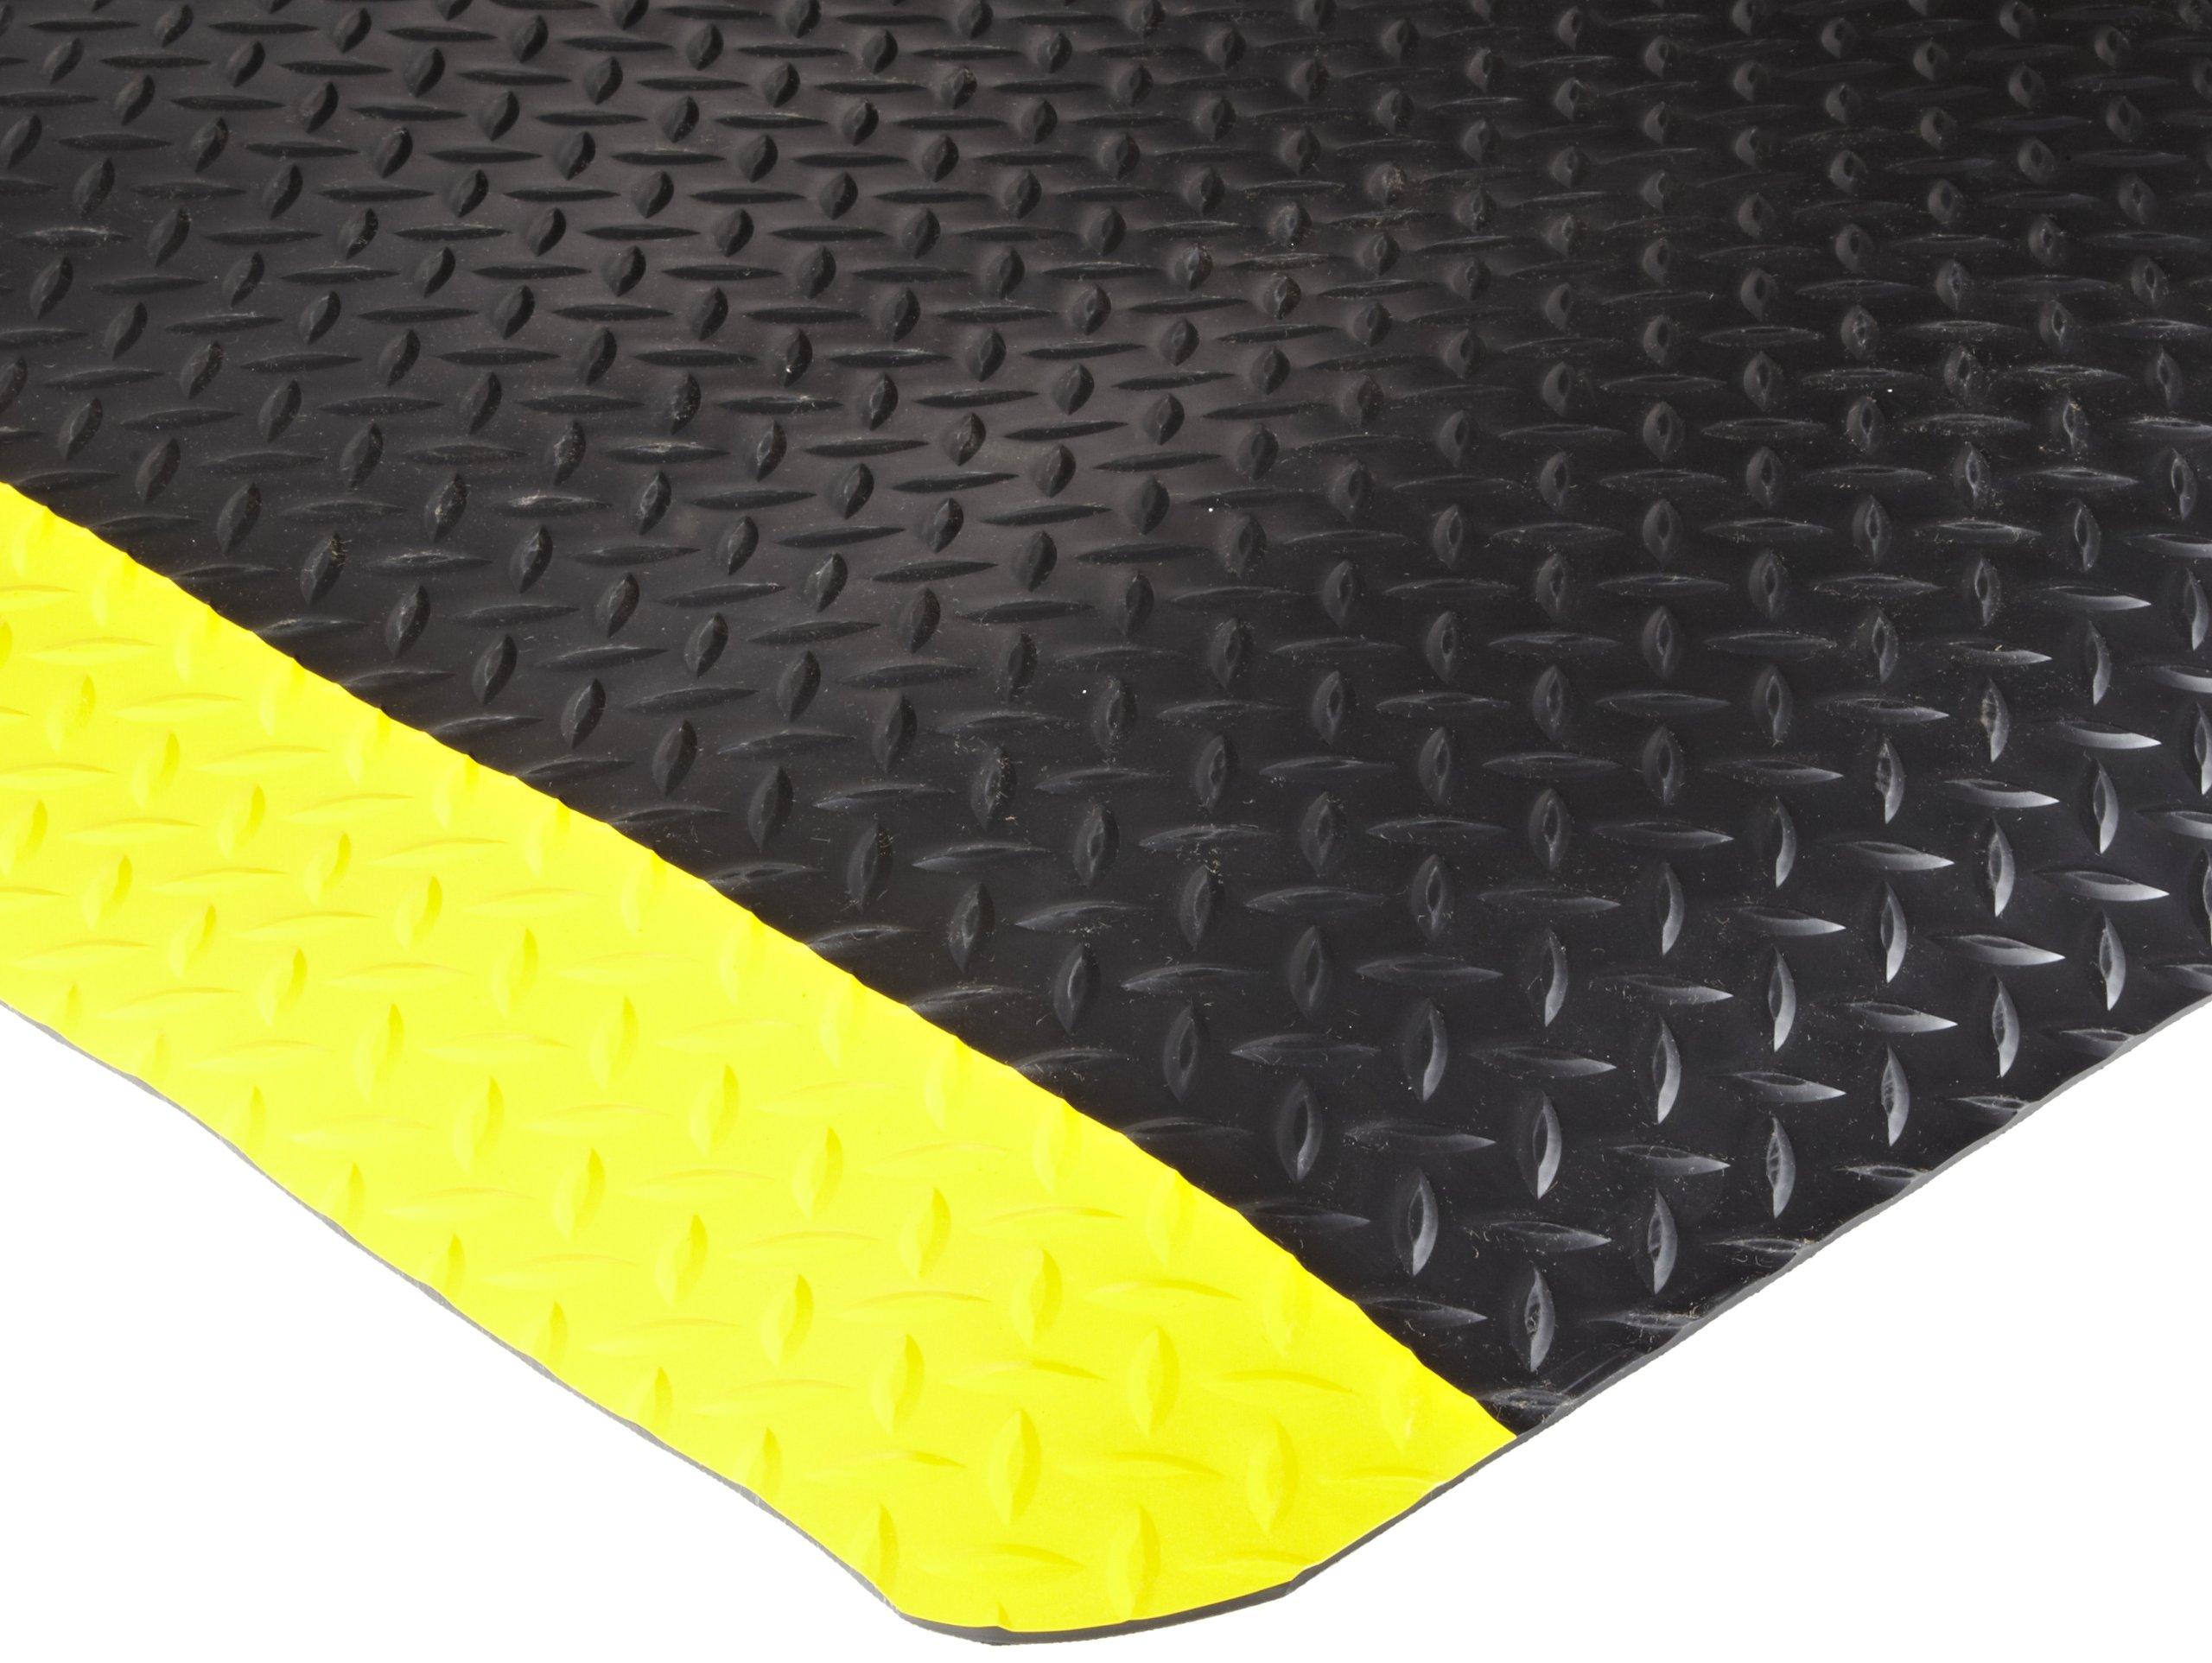 Durable Vinyl Heavy Duty Diamond-Dek Sponge Industrial Anti-Fatigue Floor Mat, 3' x 5', Black with Yellow Border by Durable Corporation